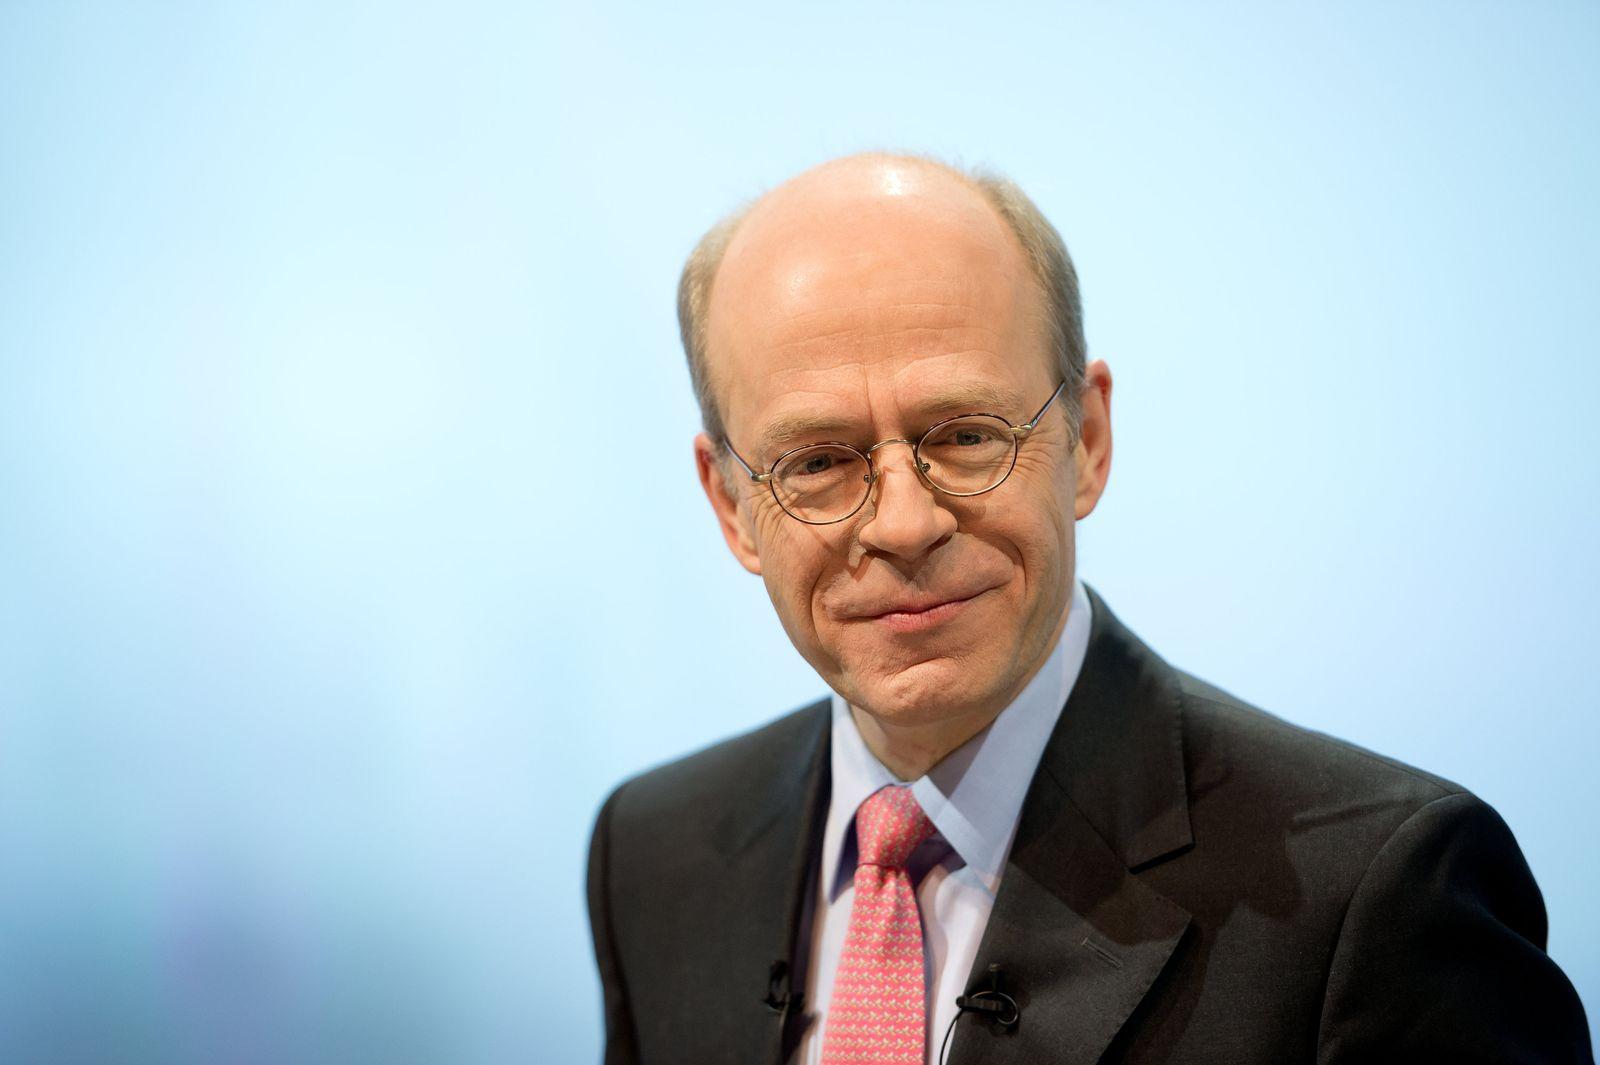 Nikolaus von Bomhard